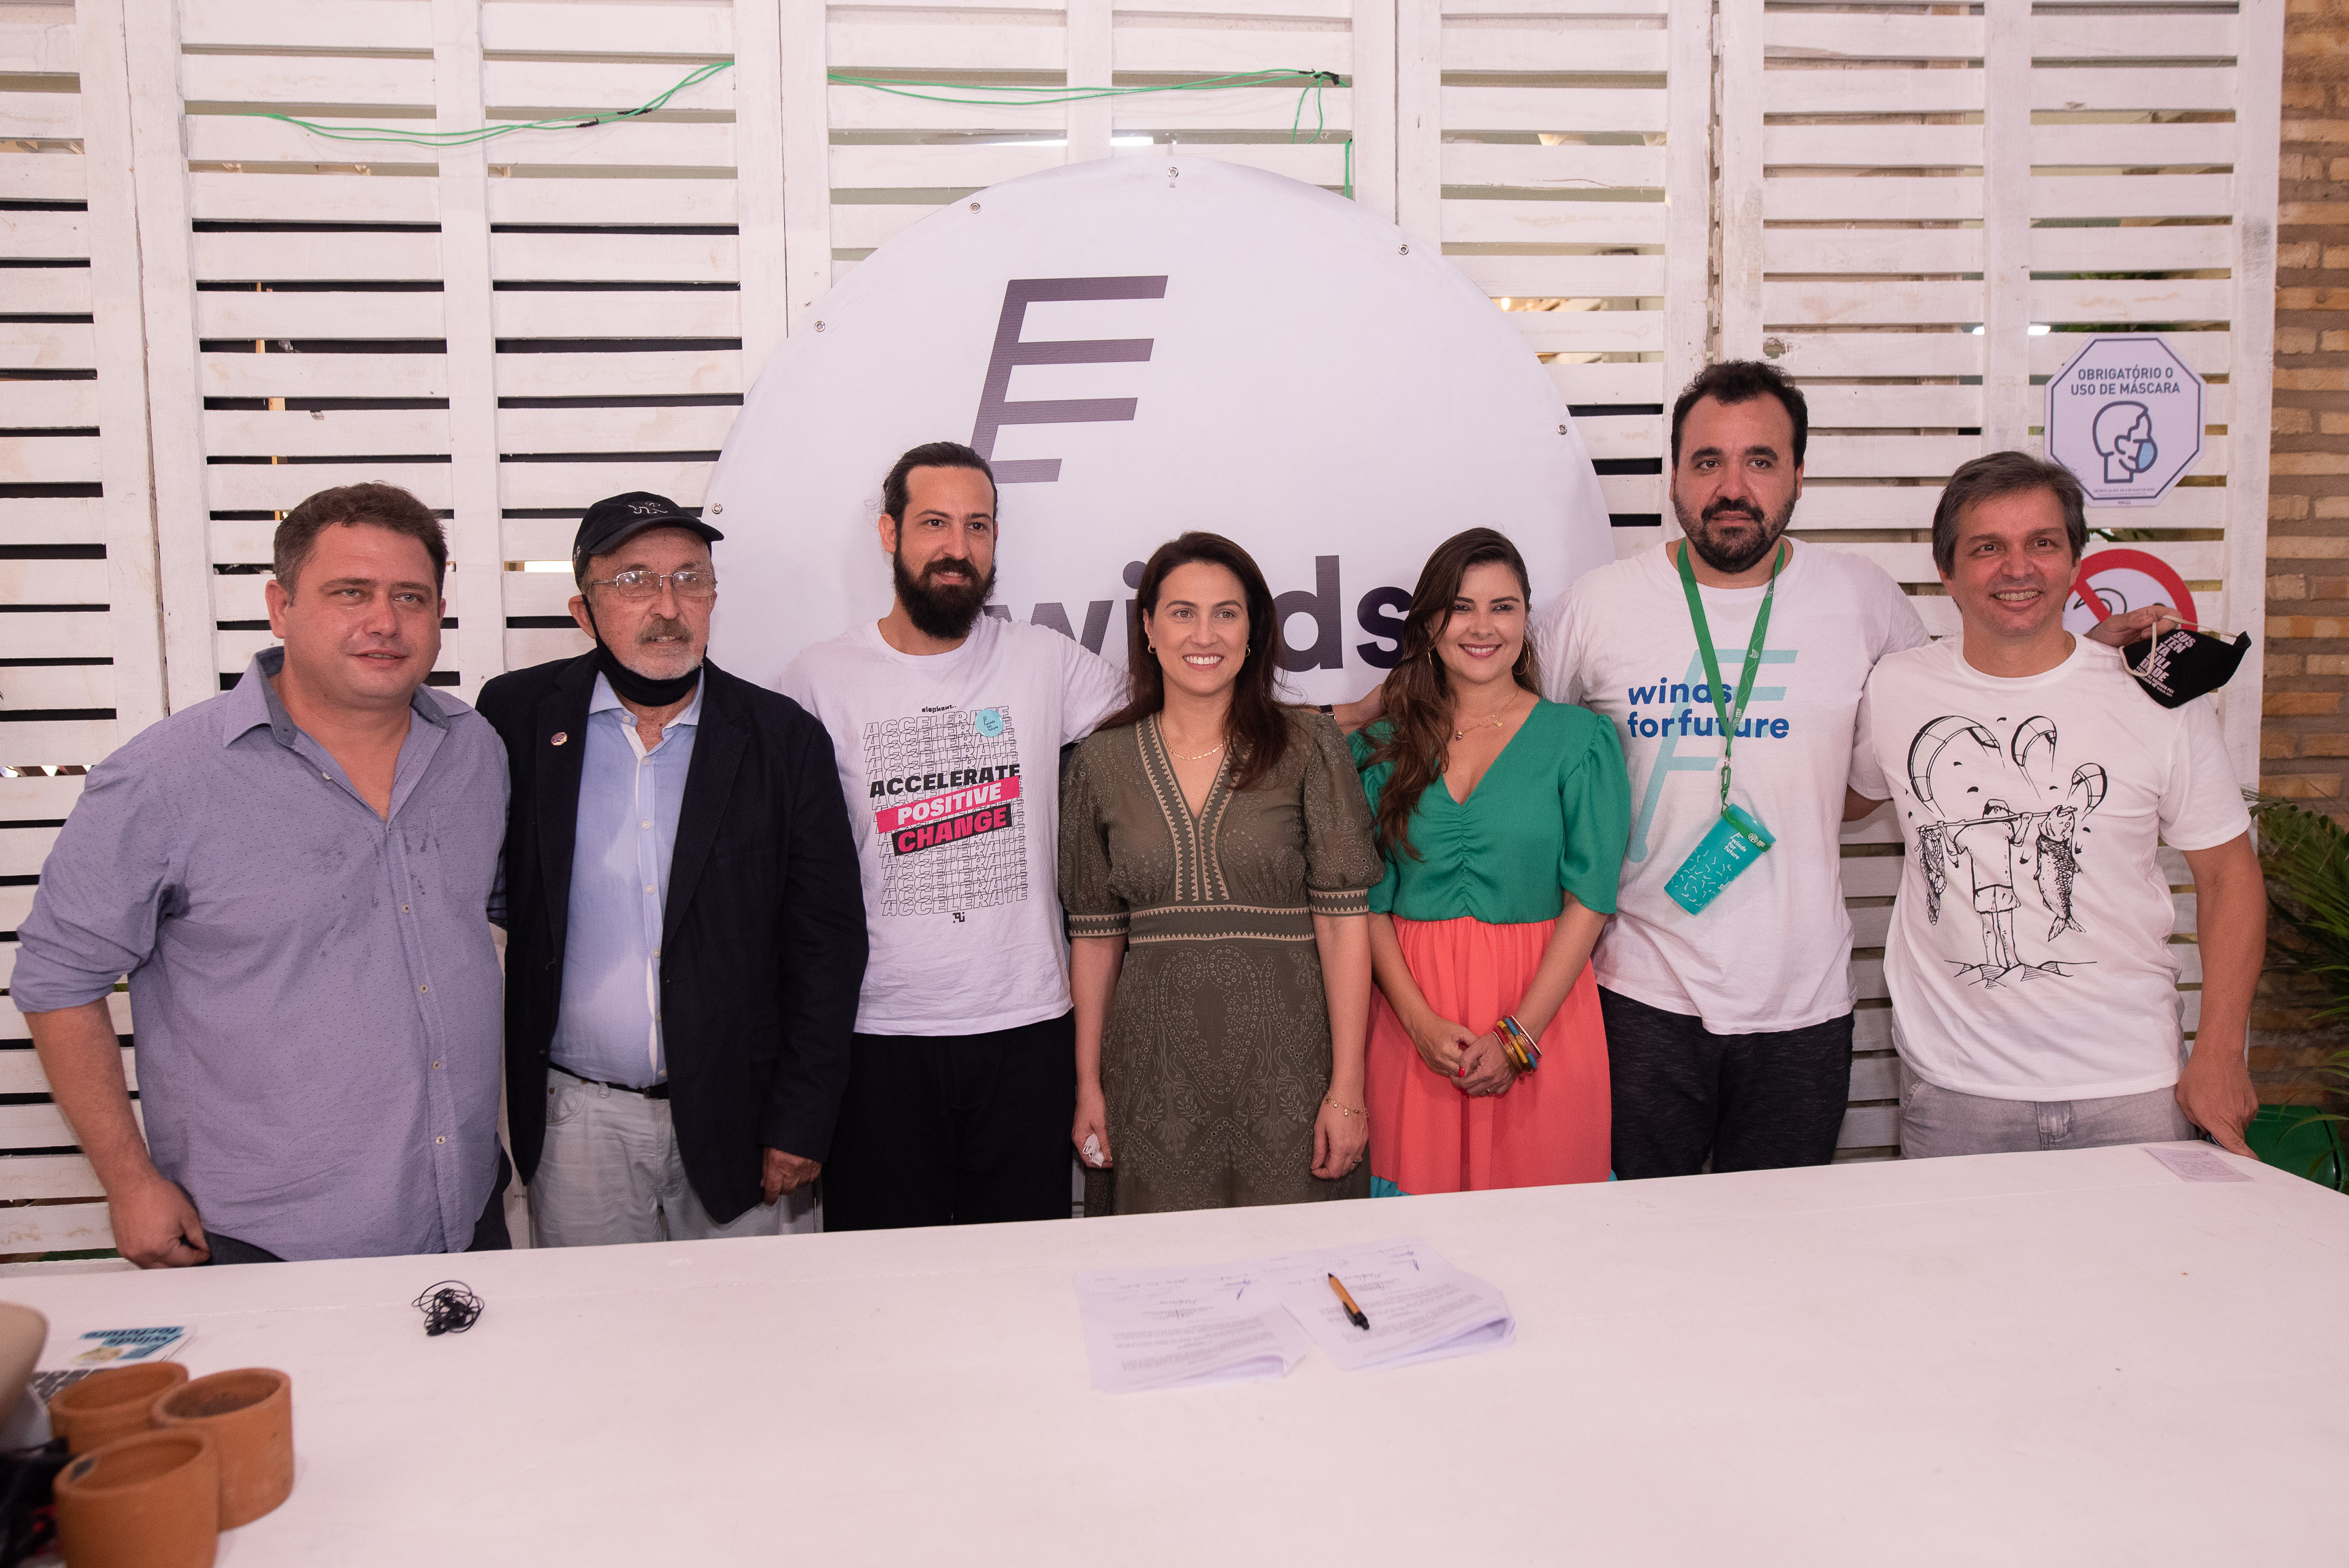 Reinaldo Chalemberge, Paulo Guerra, Andrre Farias, Erika Amorim, Adelina Feitosa, Igor Ary Juacaba E Romulo Soares